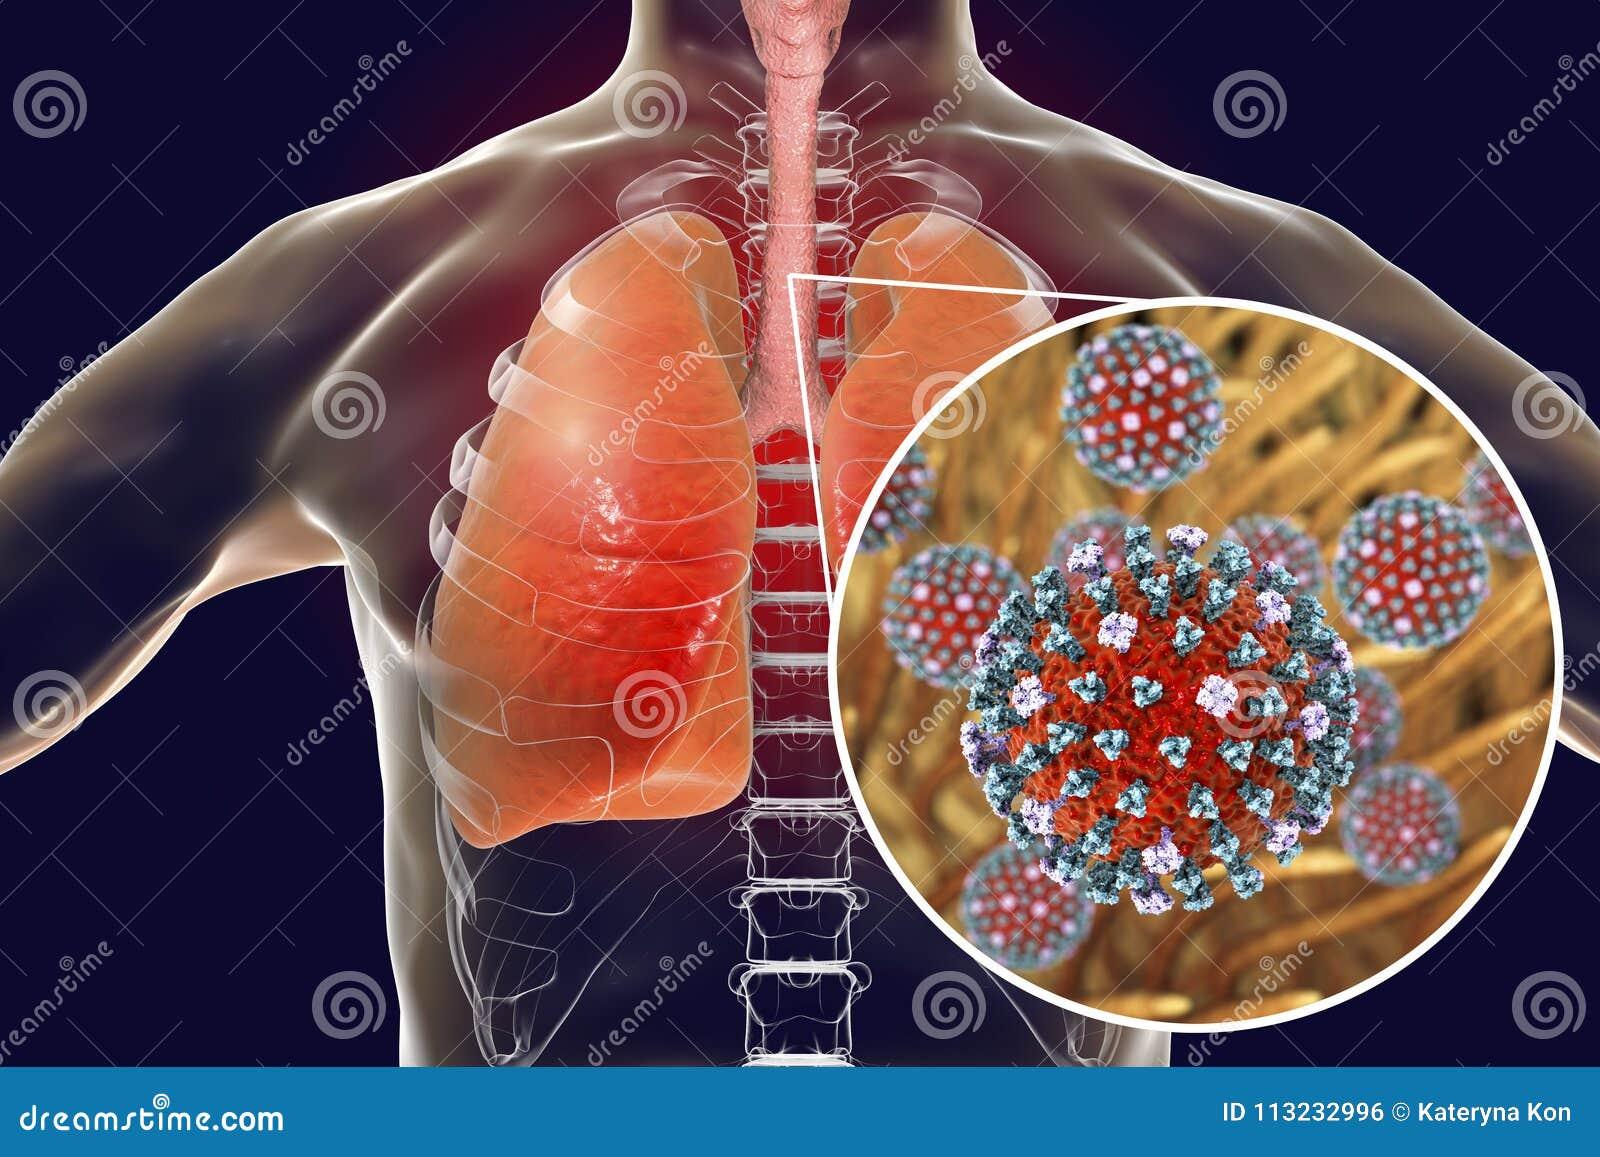 Flu Viruses In Human Lungs Stock Illustration Illustration Of